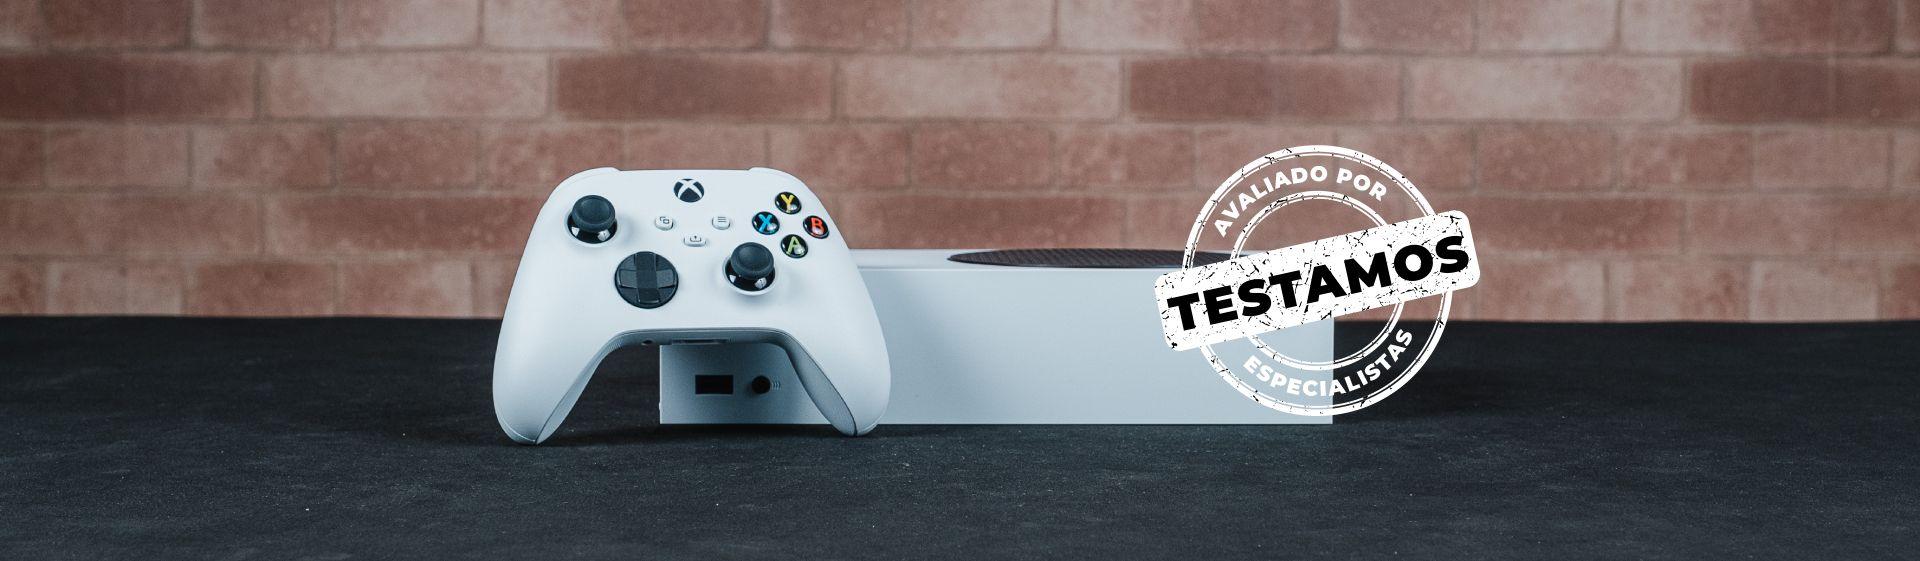 Xbox Series S branco em cima de mesa